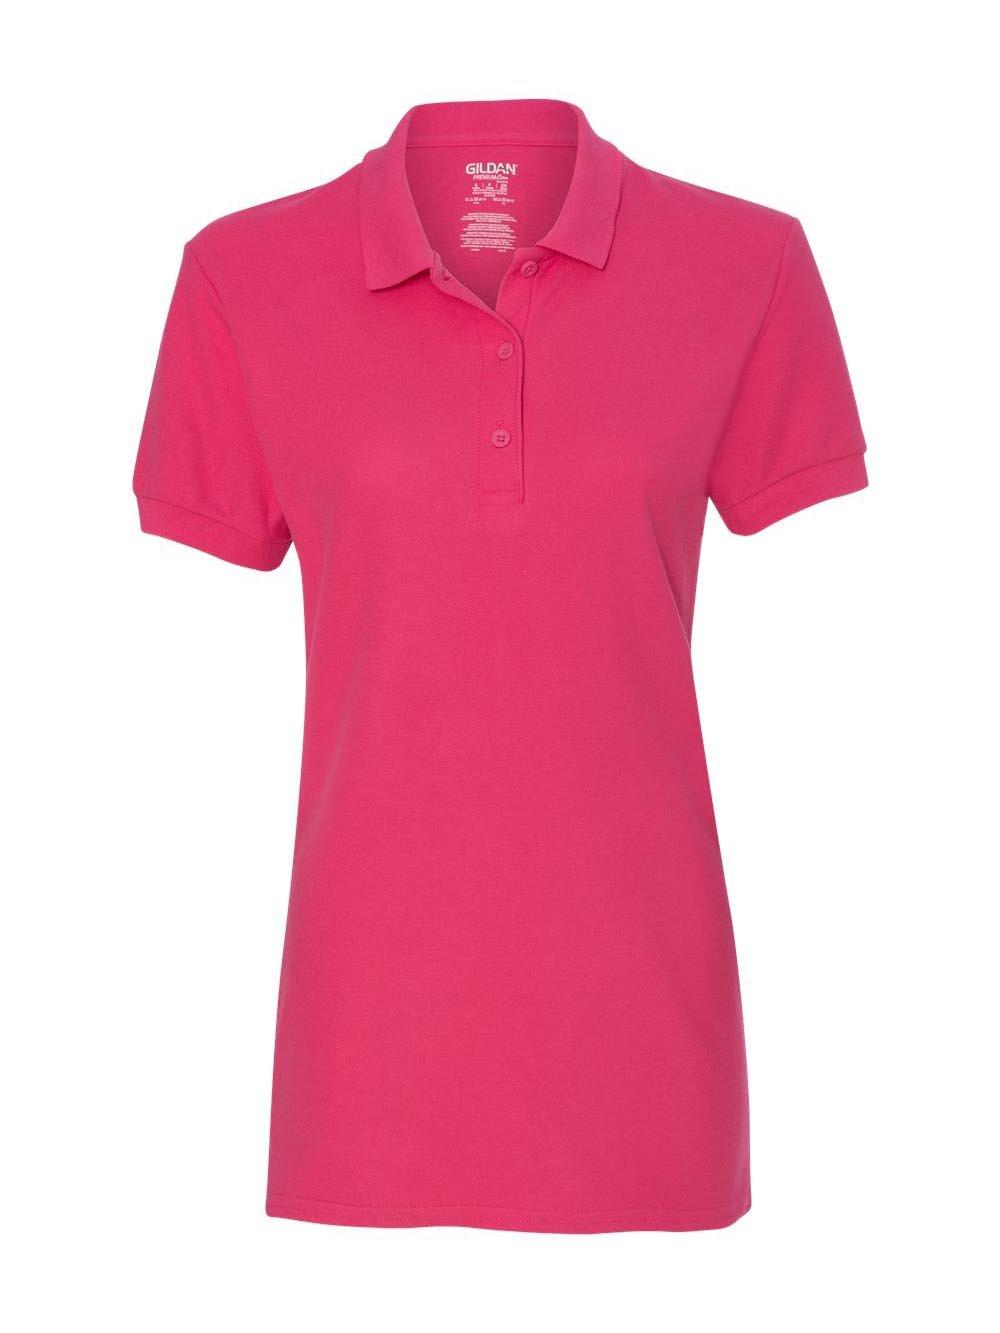 Gildan 82800L Premium Cotton Ladies Polo - Heliconia - XL